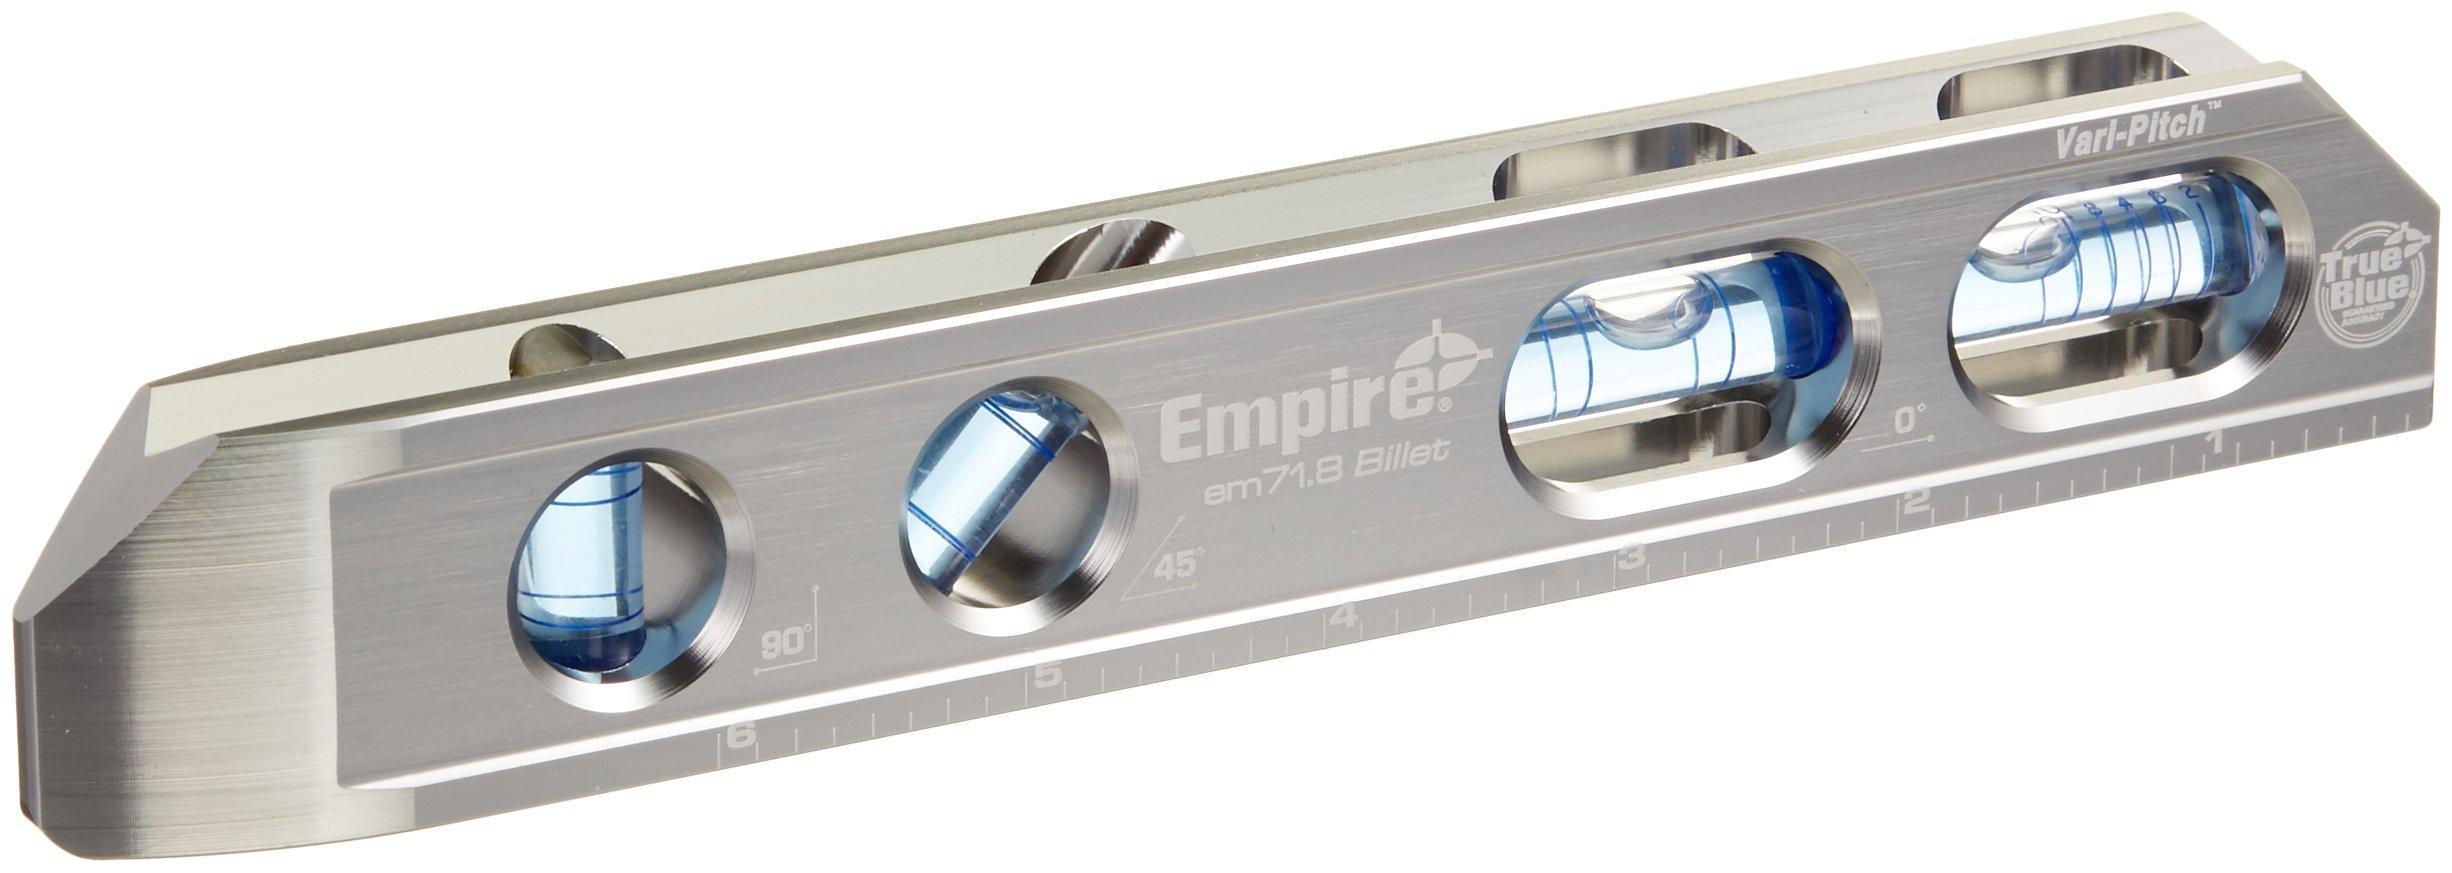 Empire EM71 8 Professional Magnetic Level